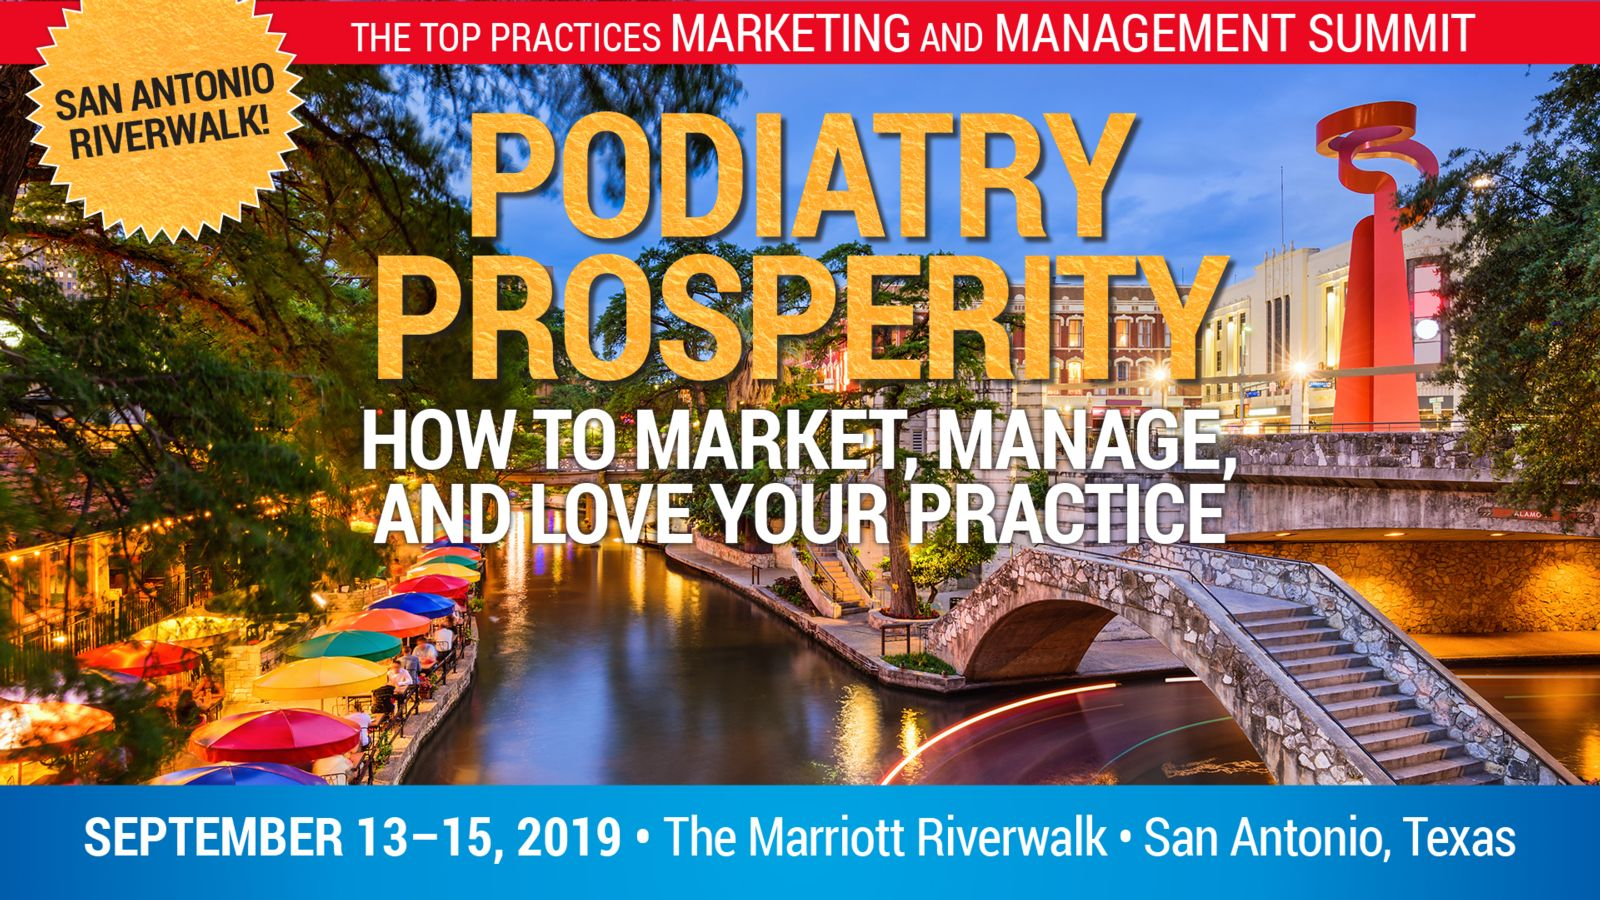 Top Practices Summit 2019